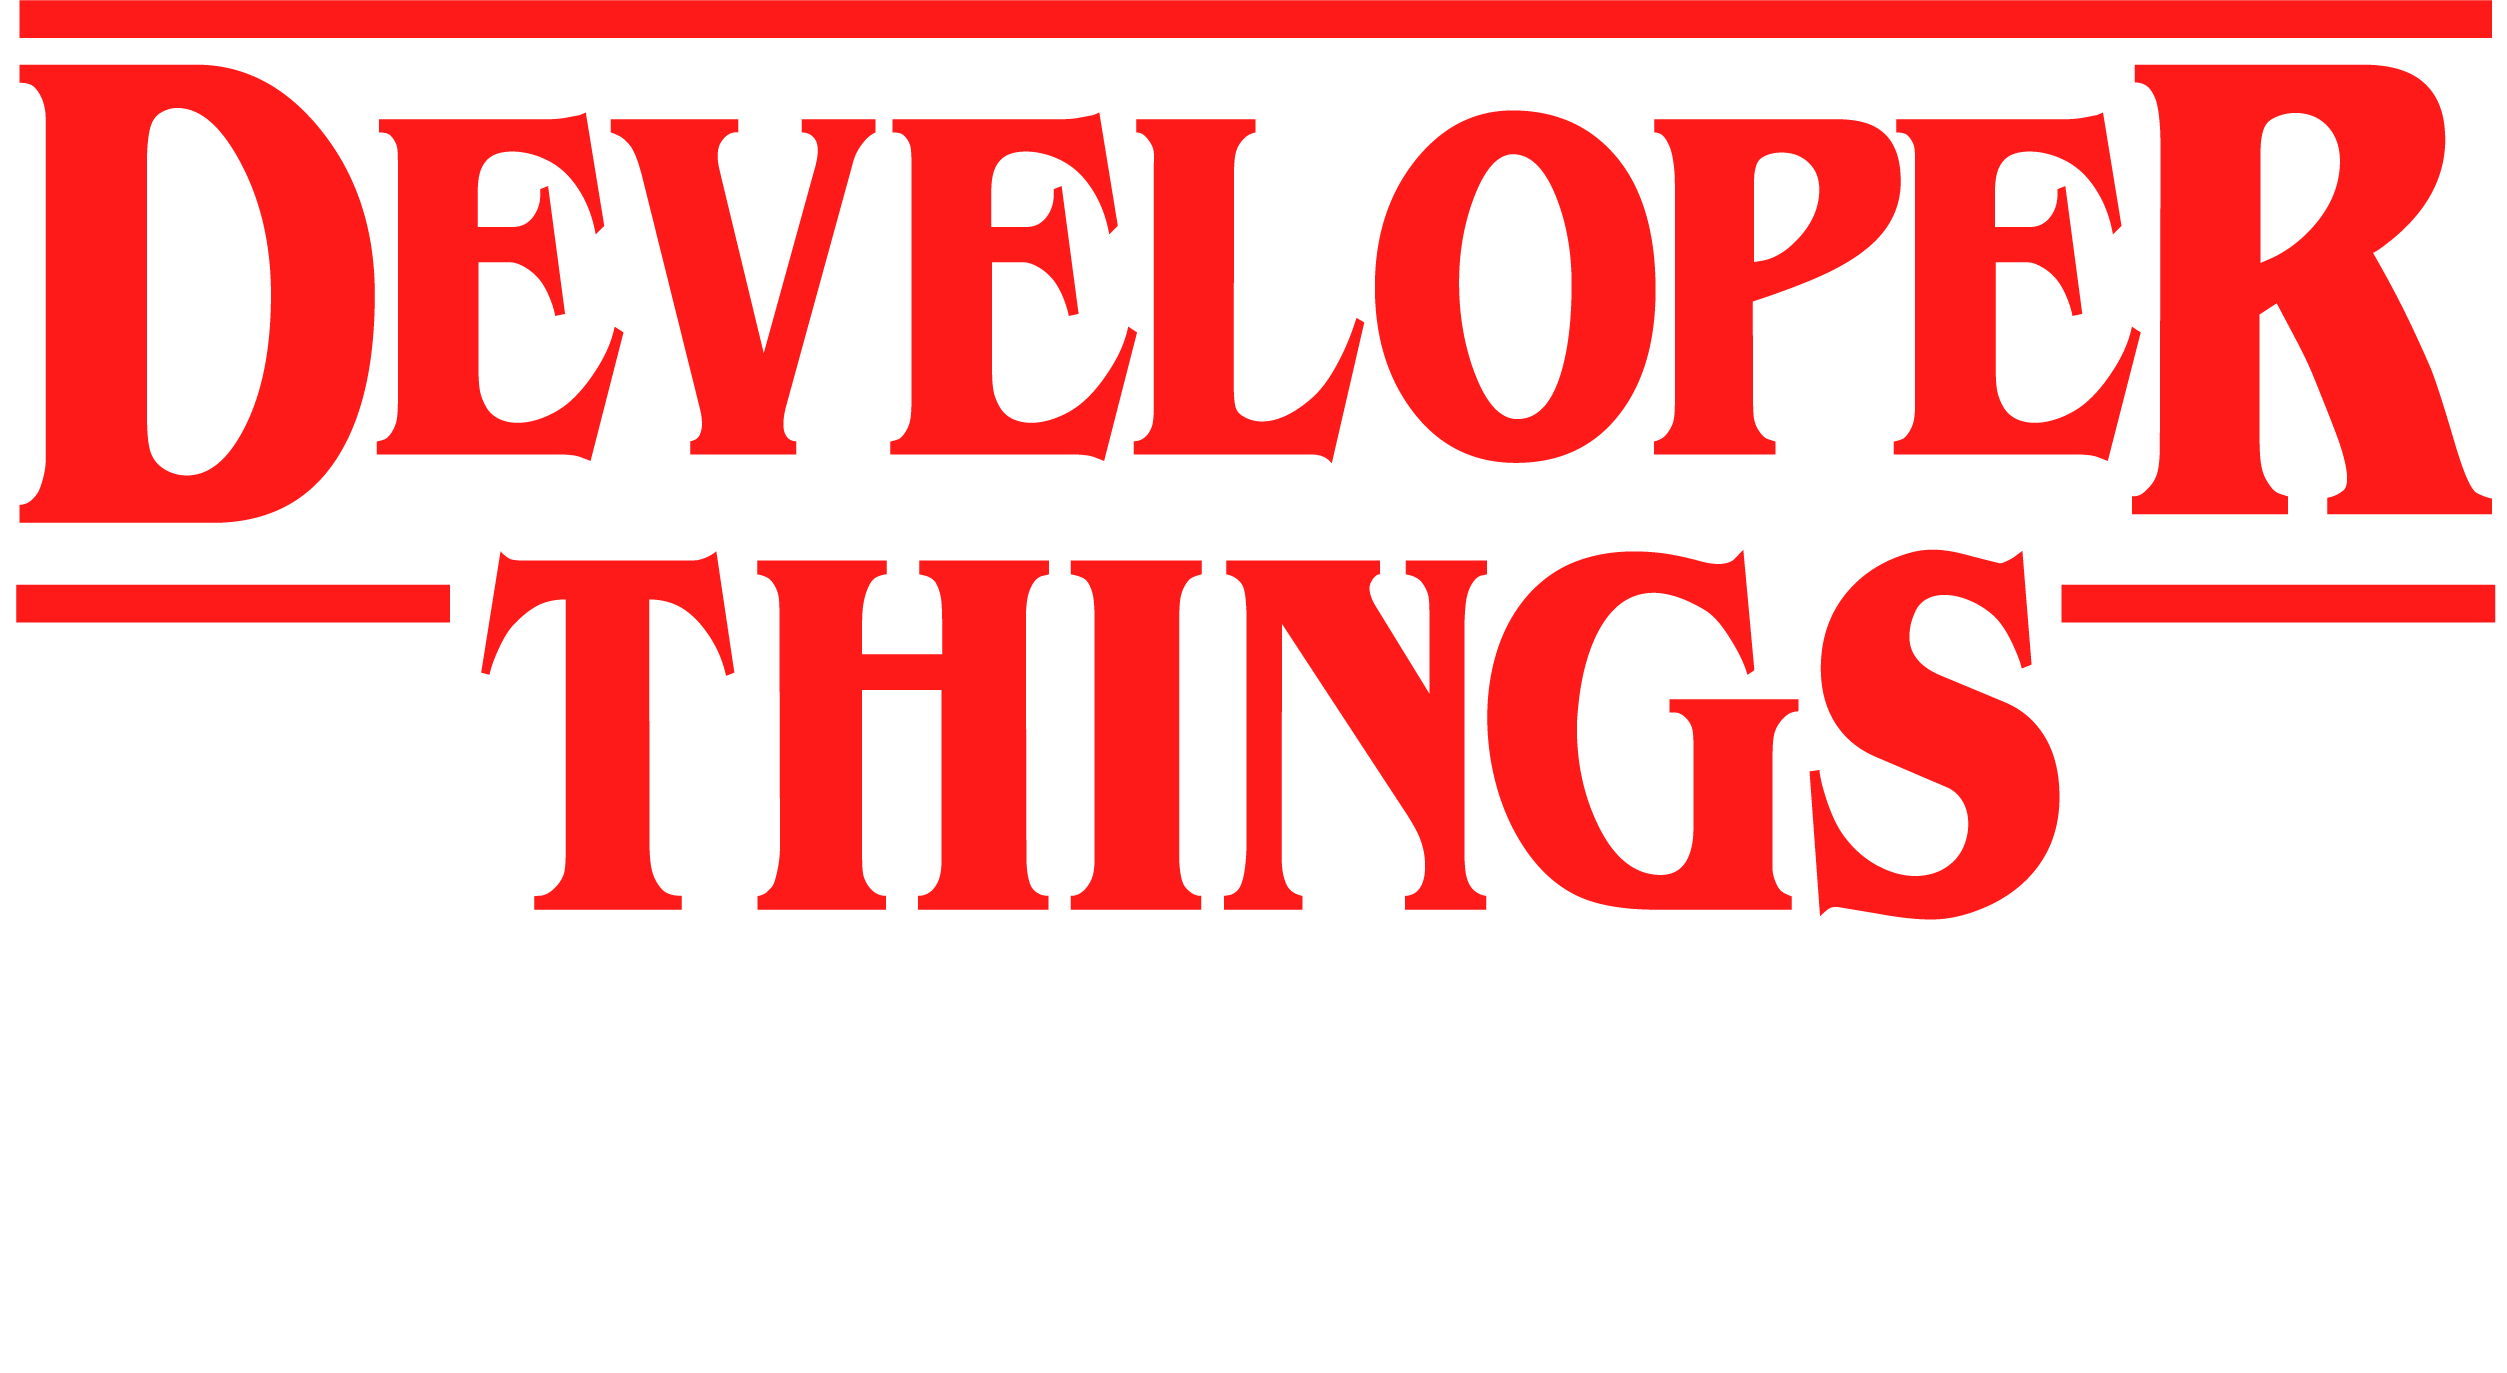 Логотип подкаста Developer Things